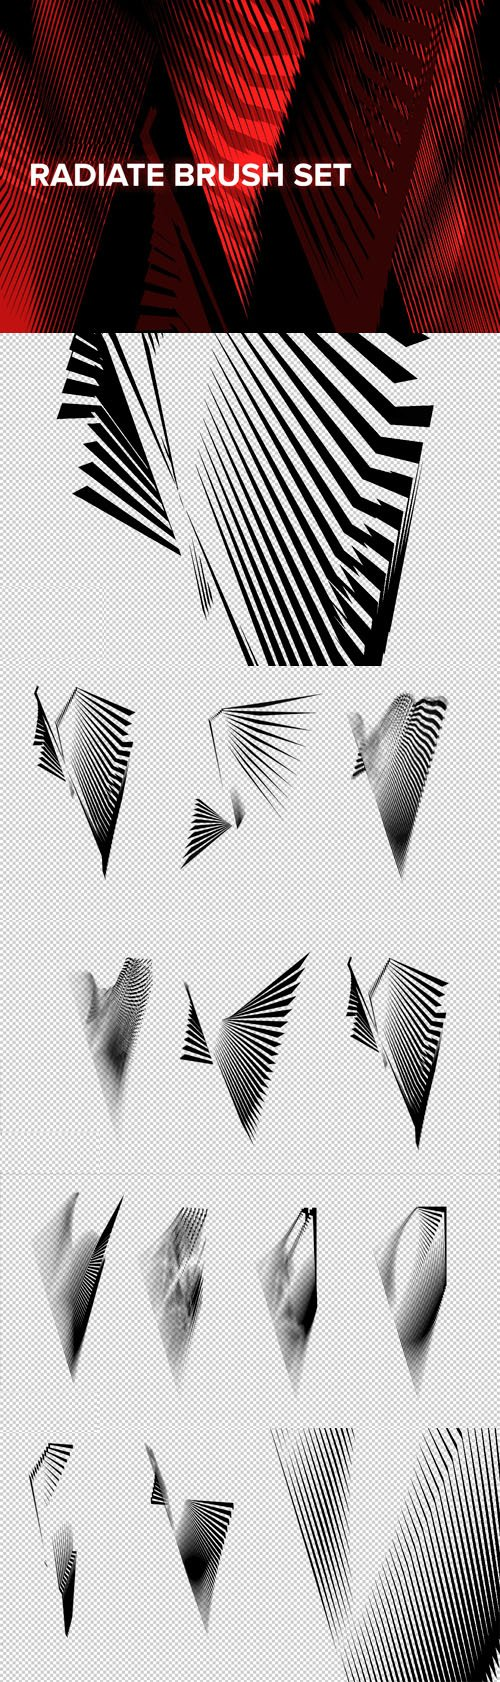 Radiate Brush Set for Photoshop